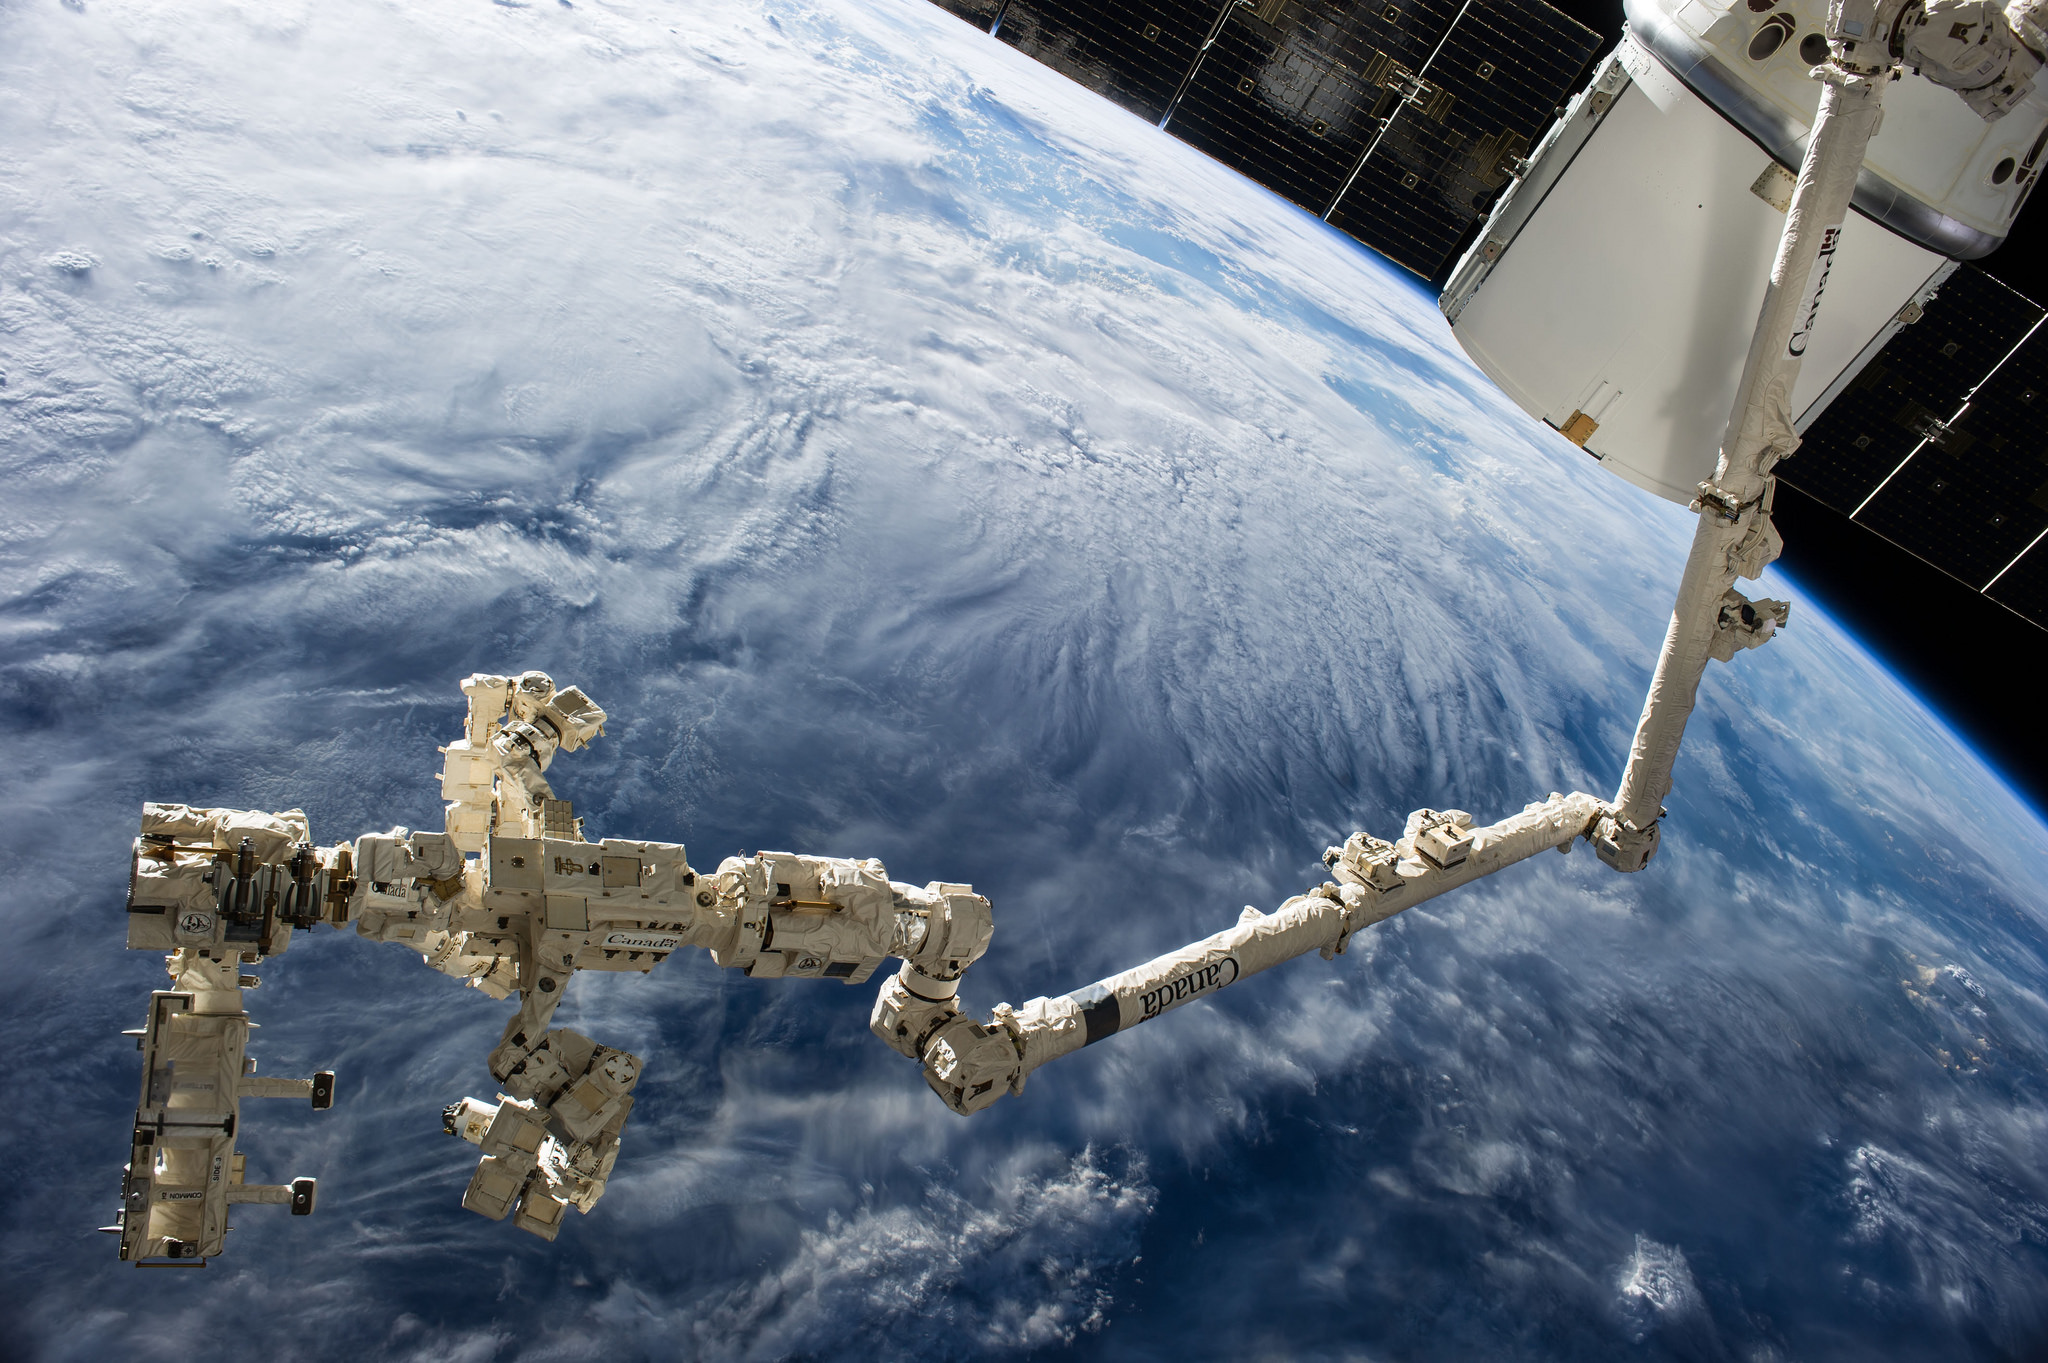 canadian astronaut international space station - photo #32